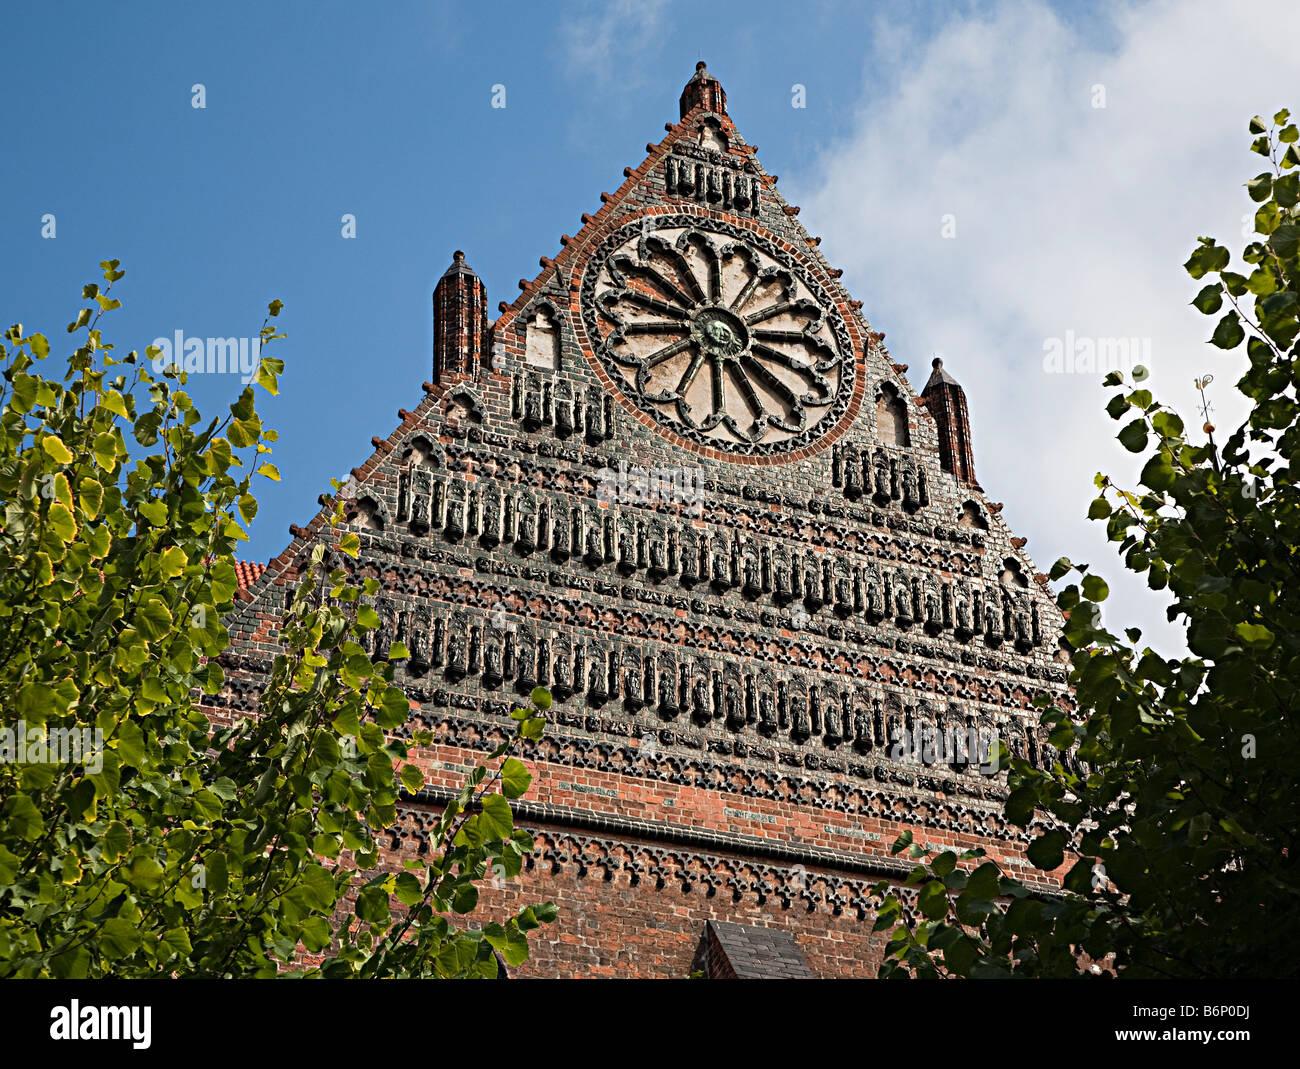 Gothic architecture of St Nikolai Kirche St Nicholas church Wismar Germany - Stock Image